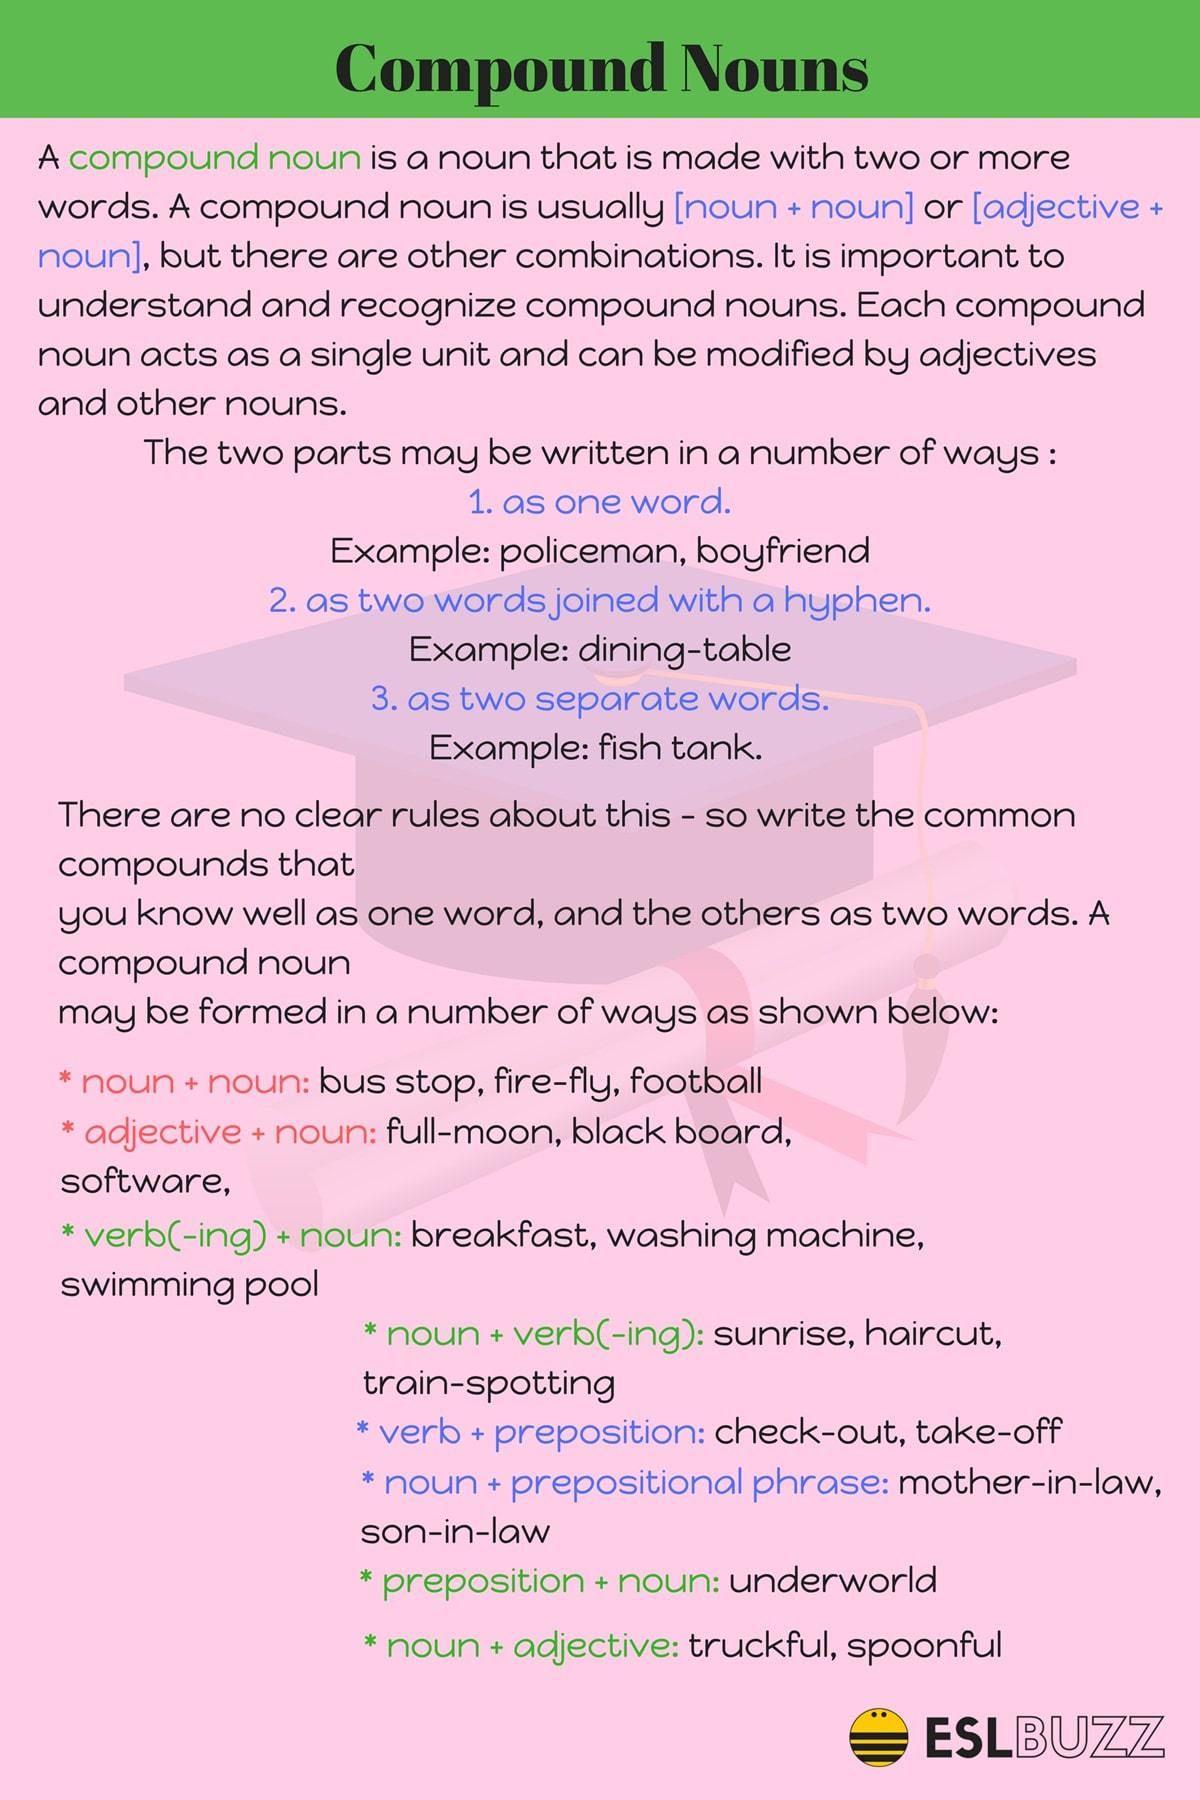 English Grammar Compound Nouns